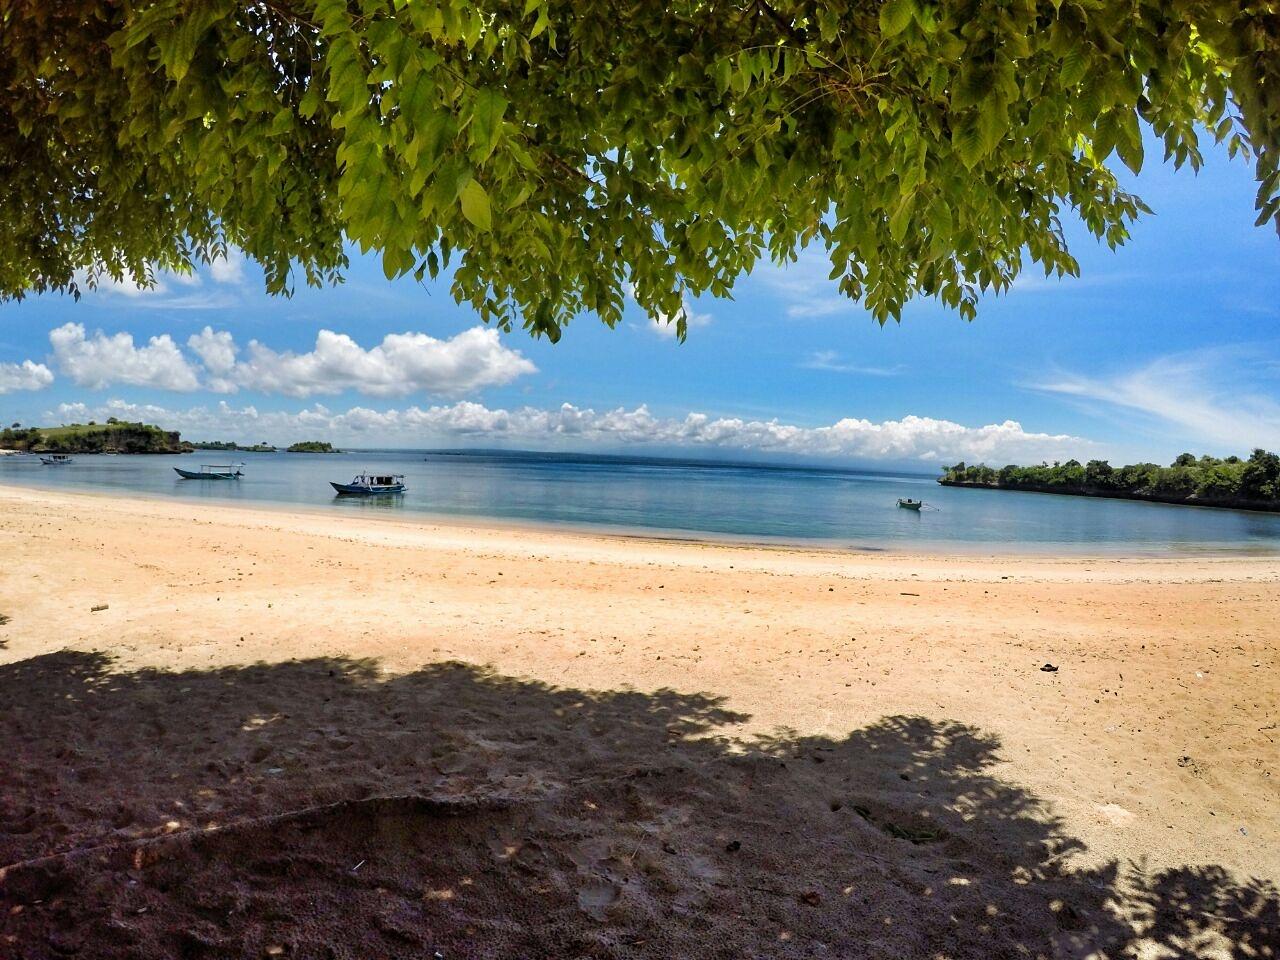 Lombok - lombok honeymoon trip - Lombok Tour Packages, YOEXPLORE